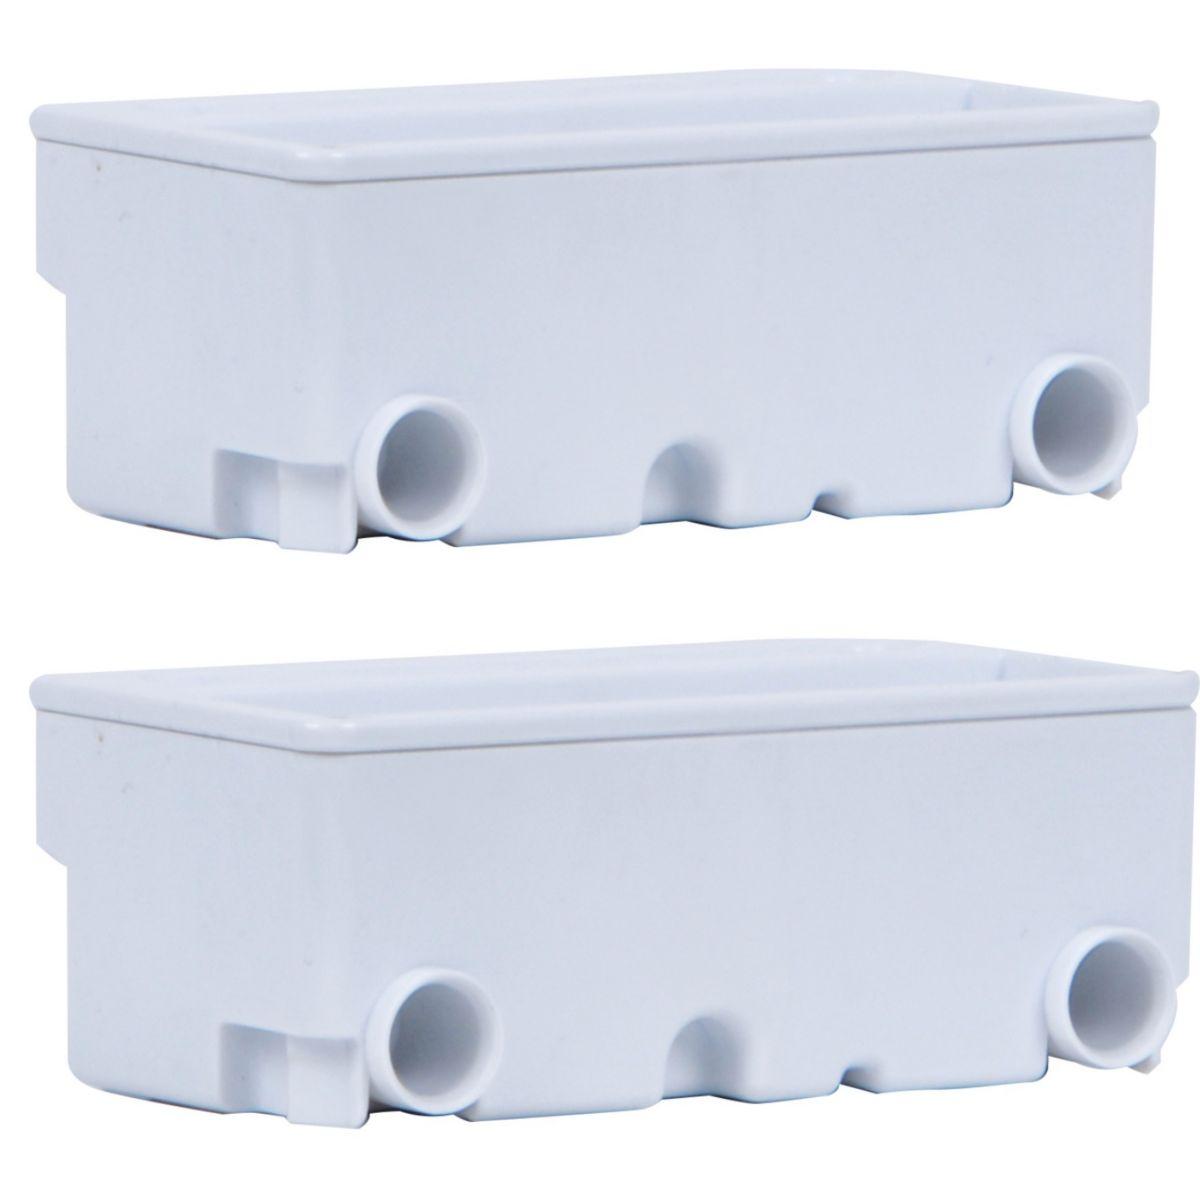 Cartouche anti-calcaire LISTO 2 cartouche pour CVD L3 & CVD L4